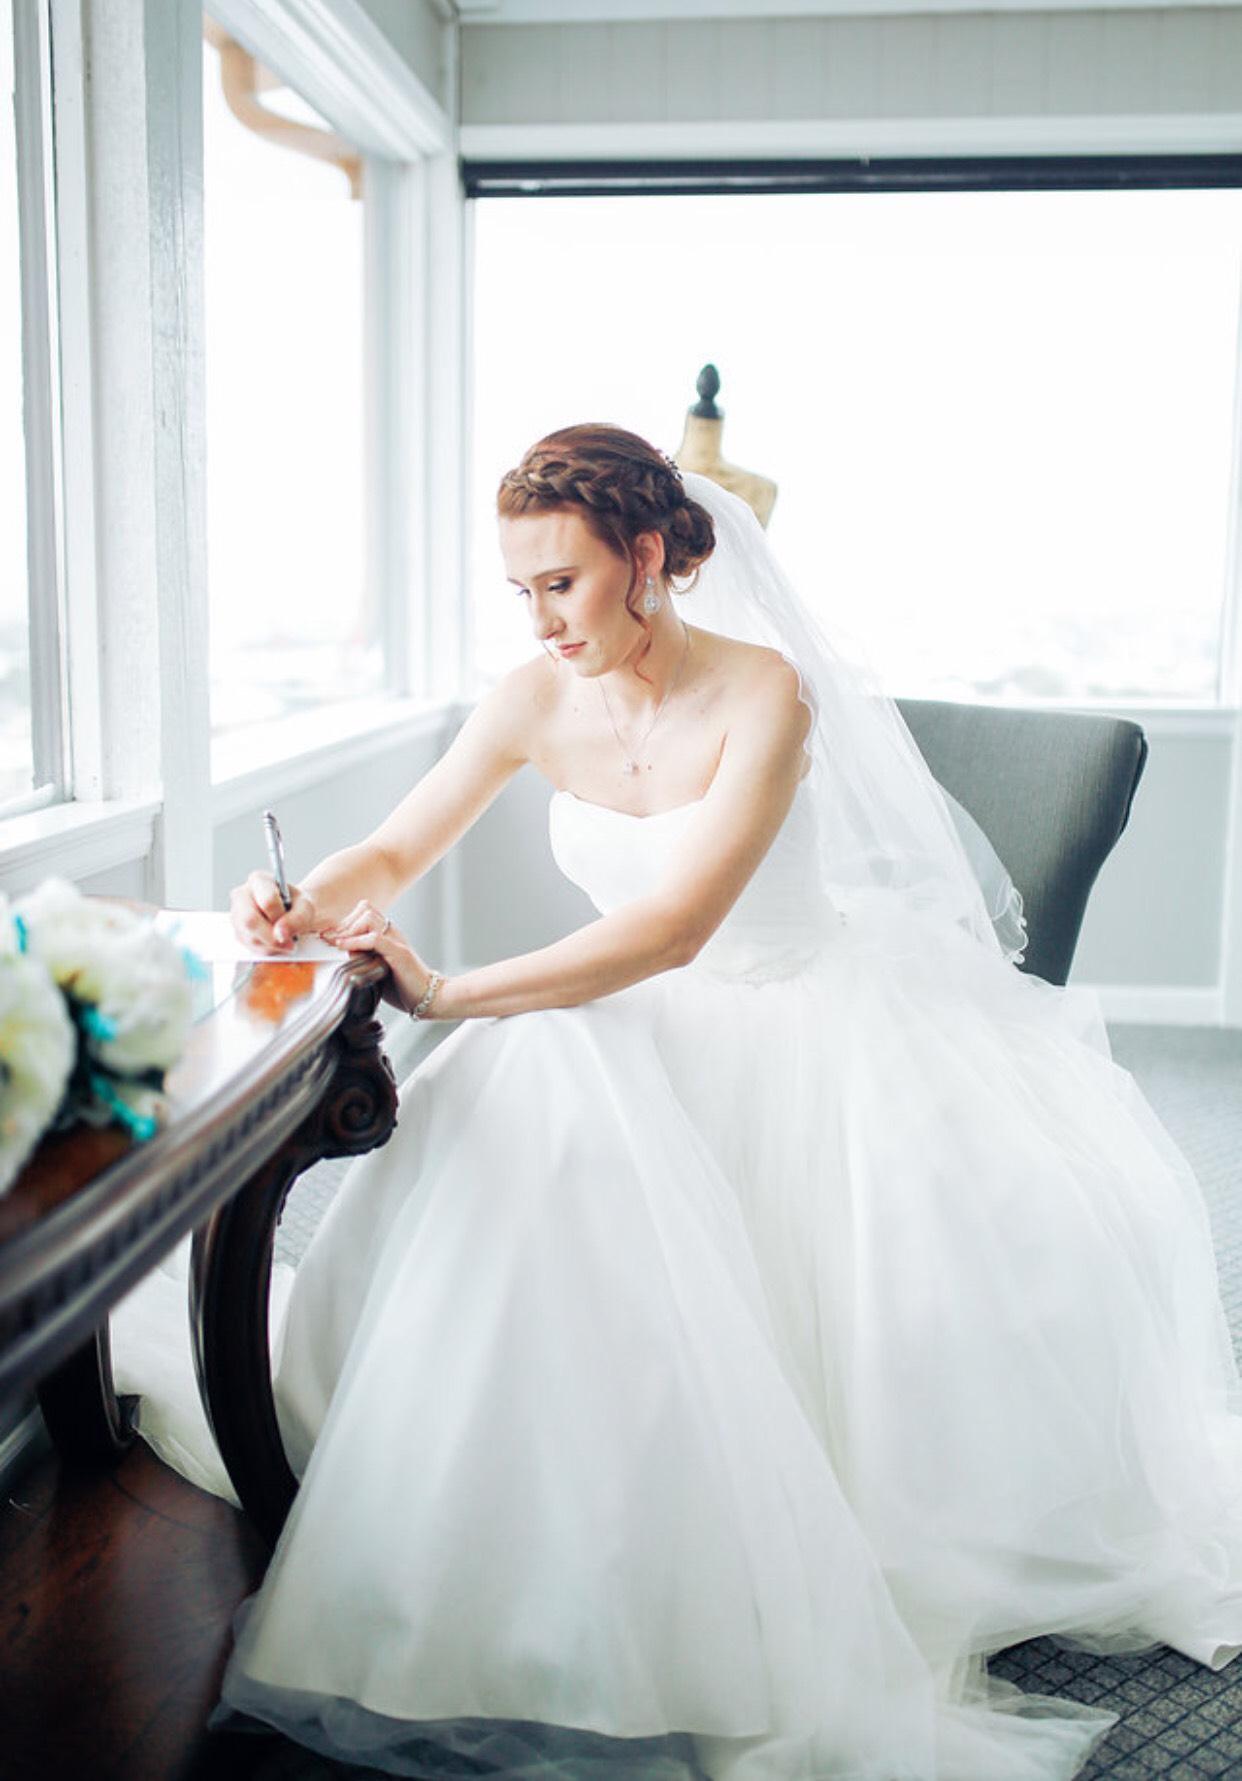 Denver-traveling-wedding-hairstylist-updo-and-braiding-specialist